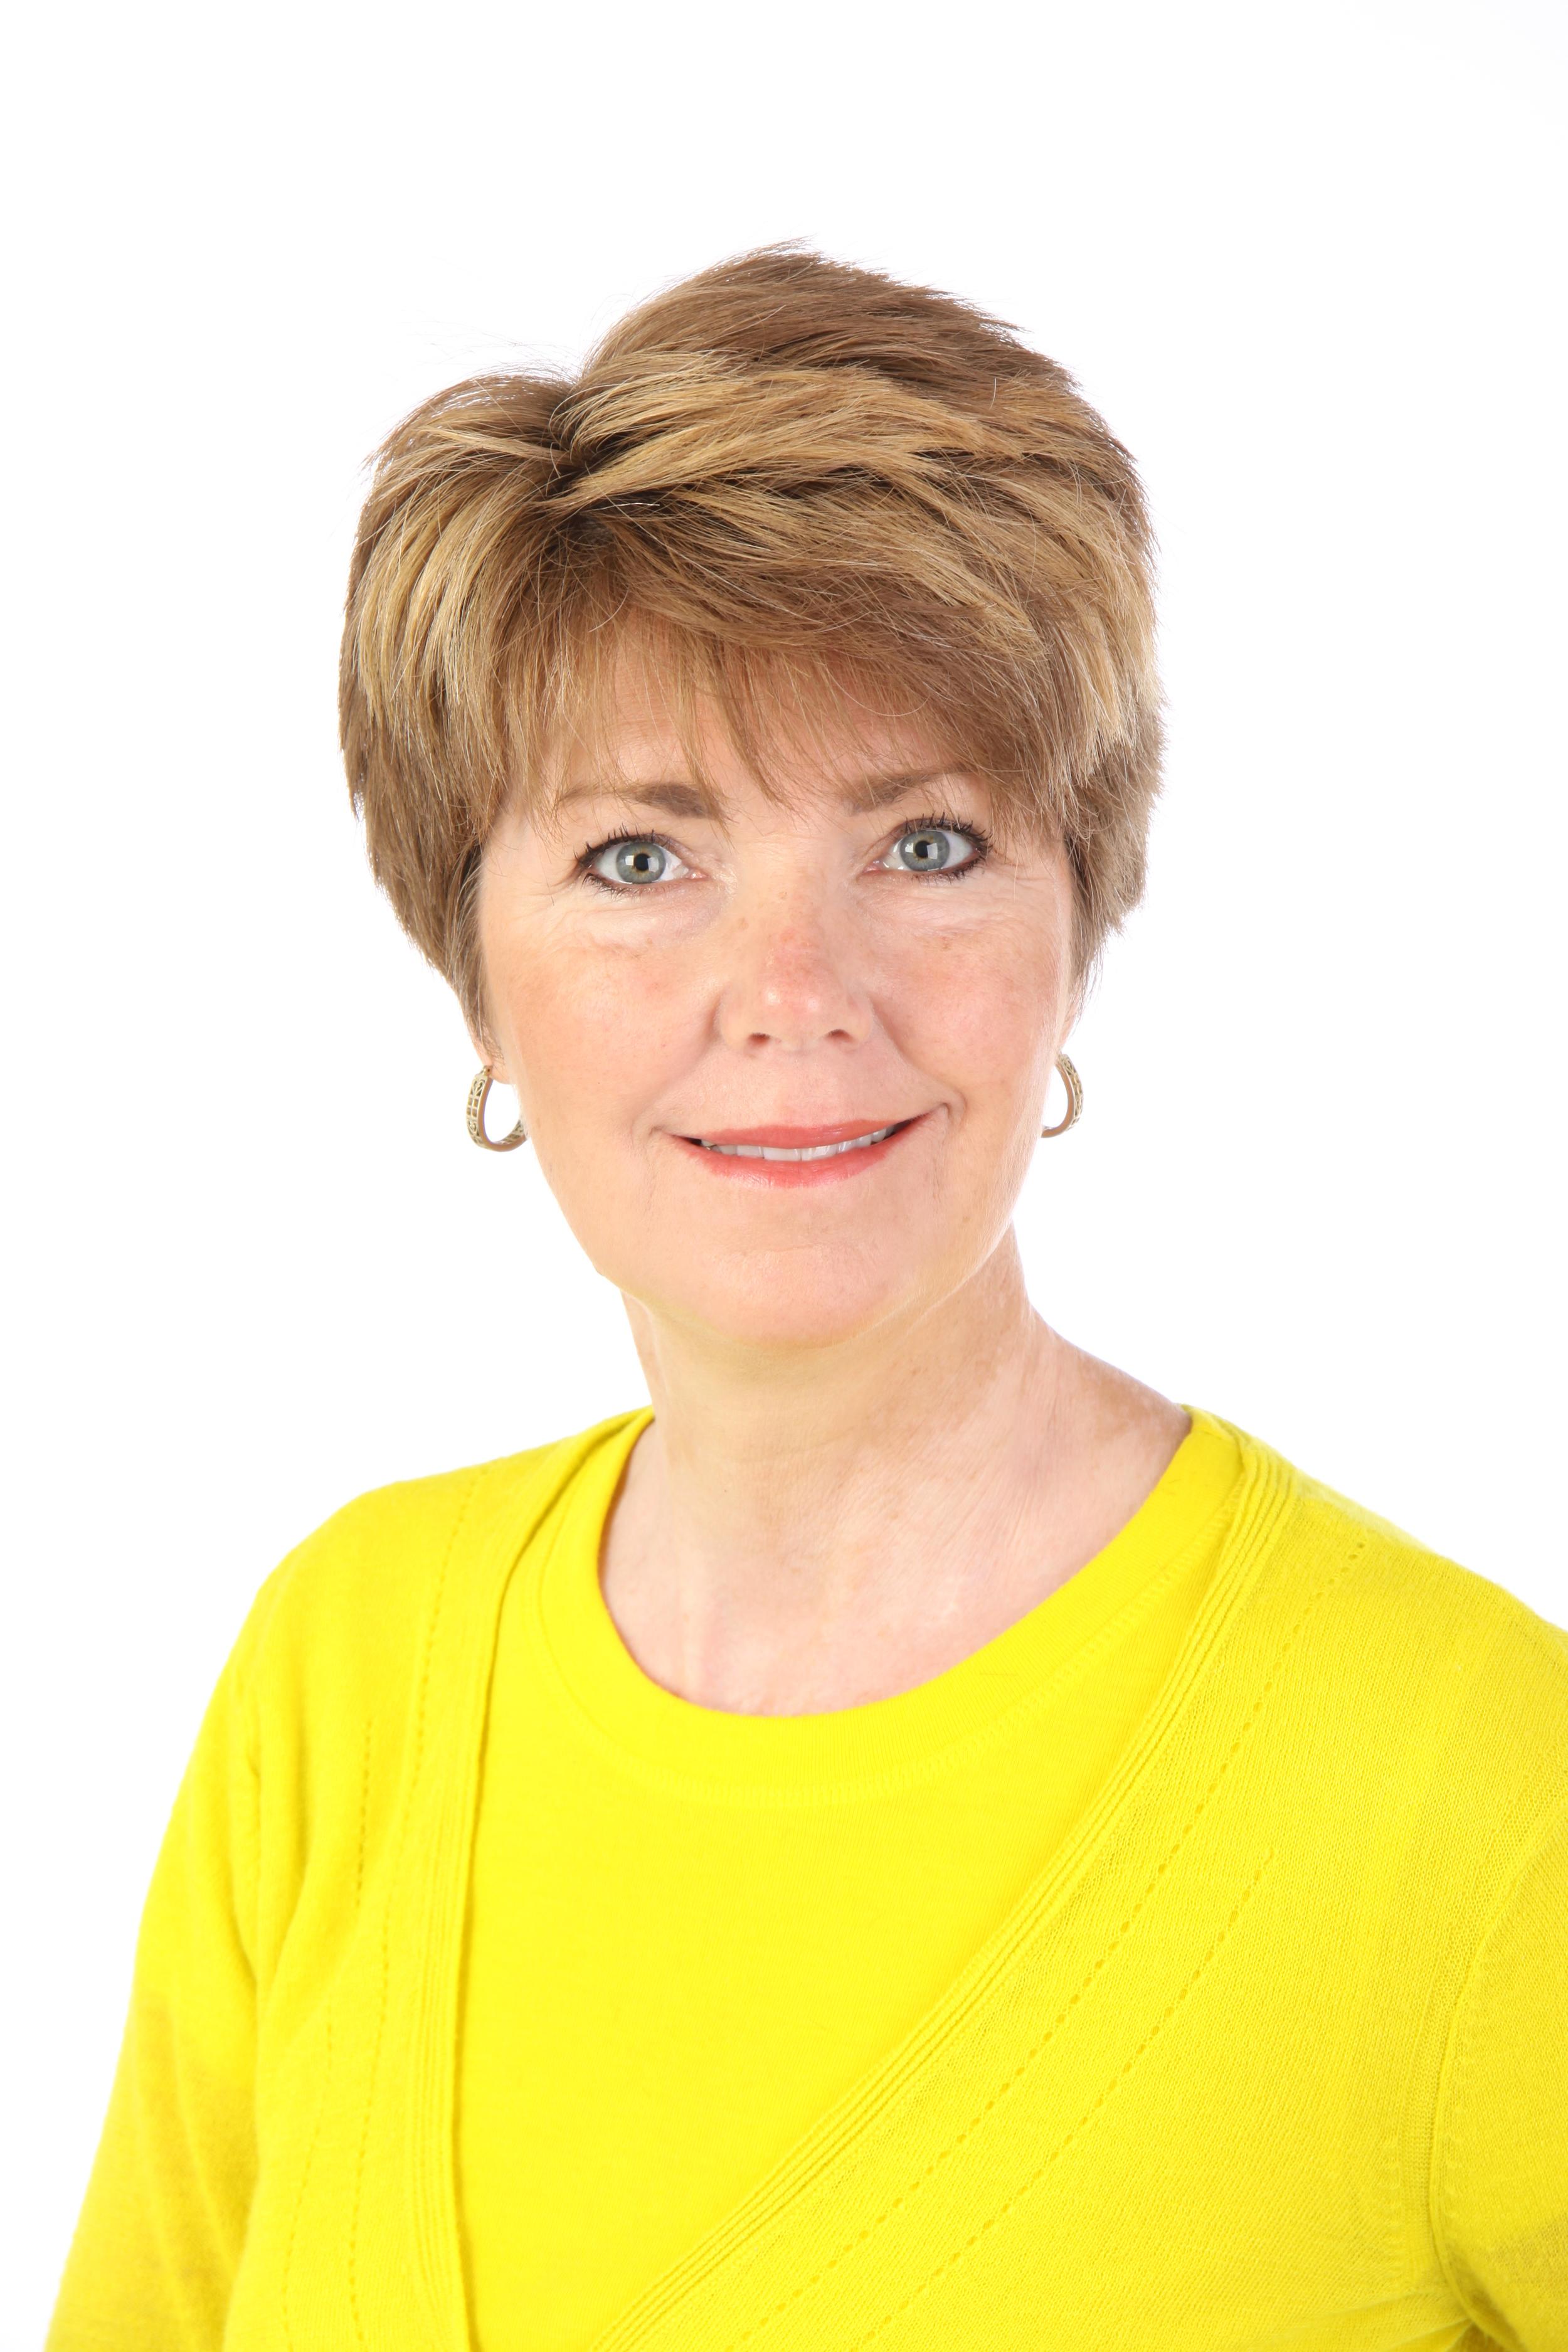 Susan B. Sorenson, ARNP, CPNP,PMHS